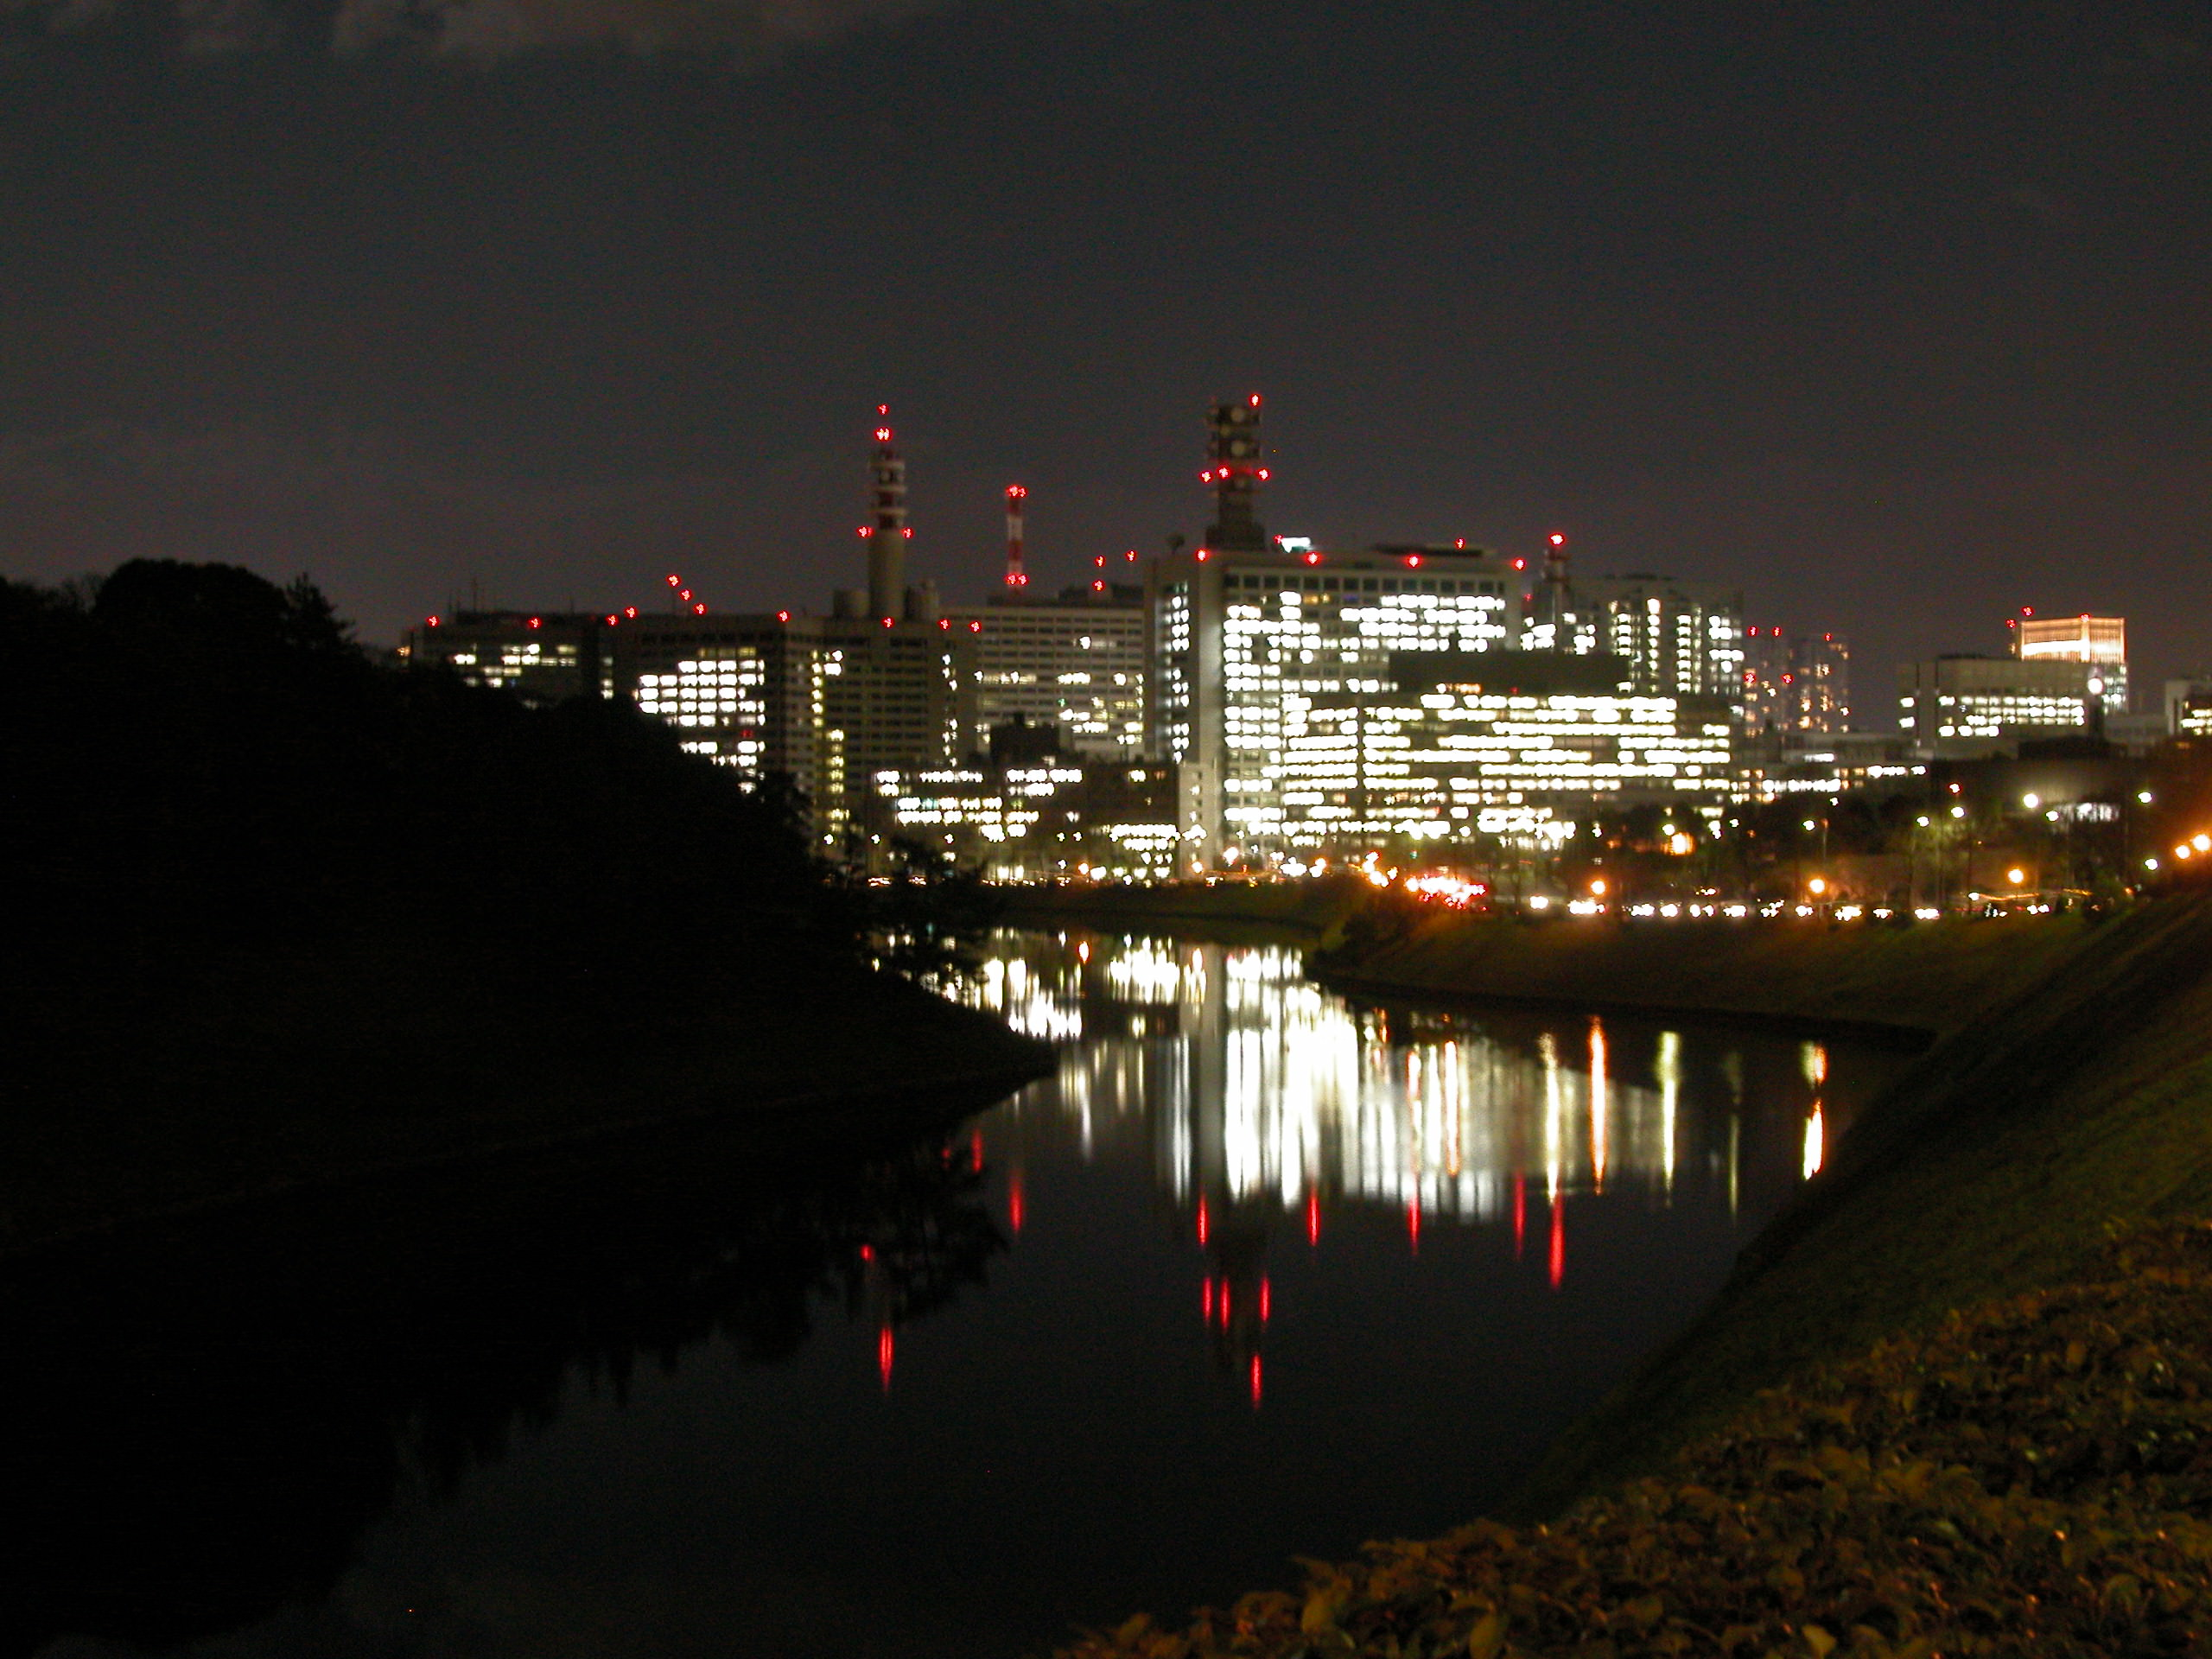 研究会・サロン2005:渋谷 照明探偵団事務局